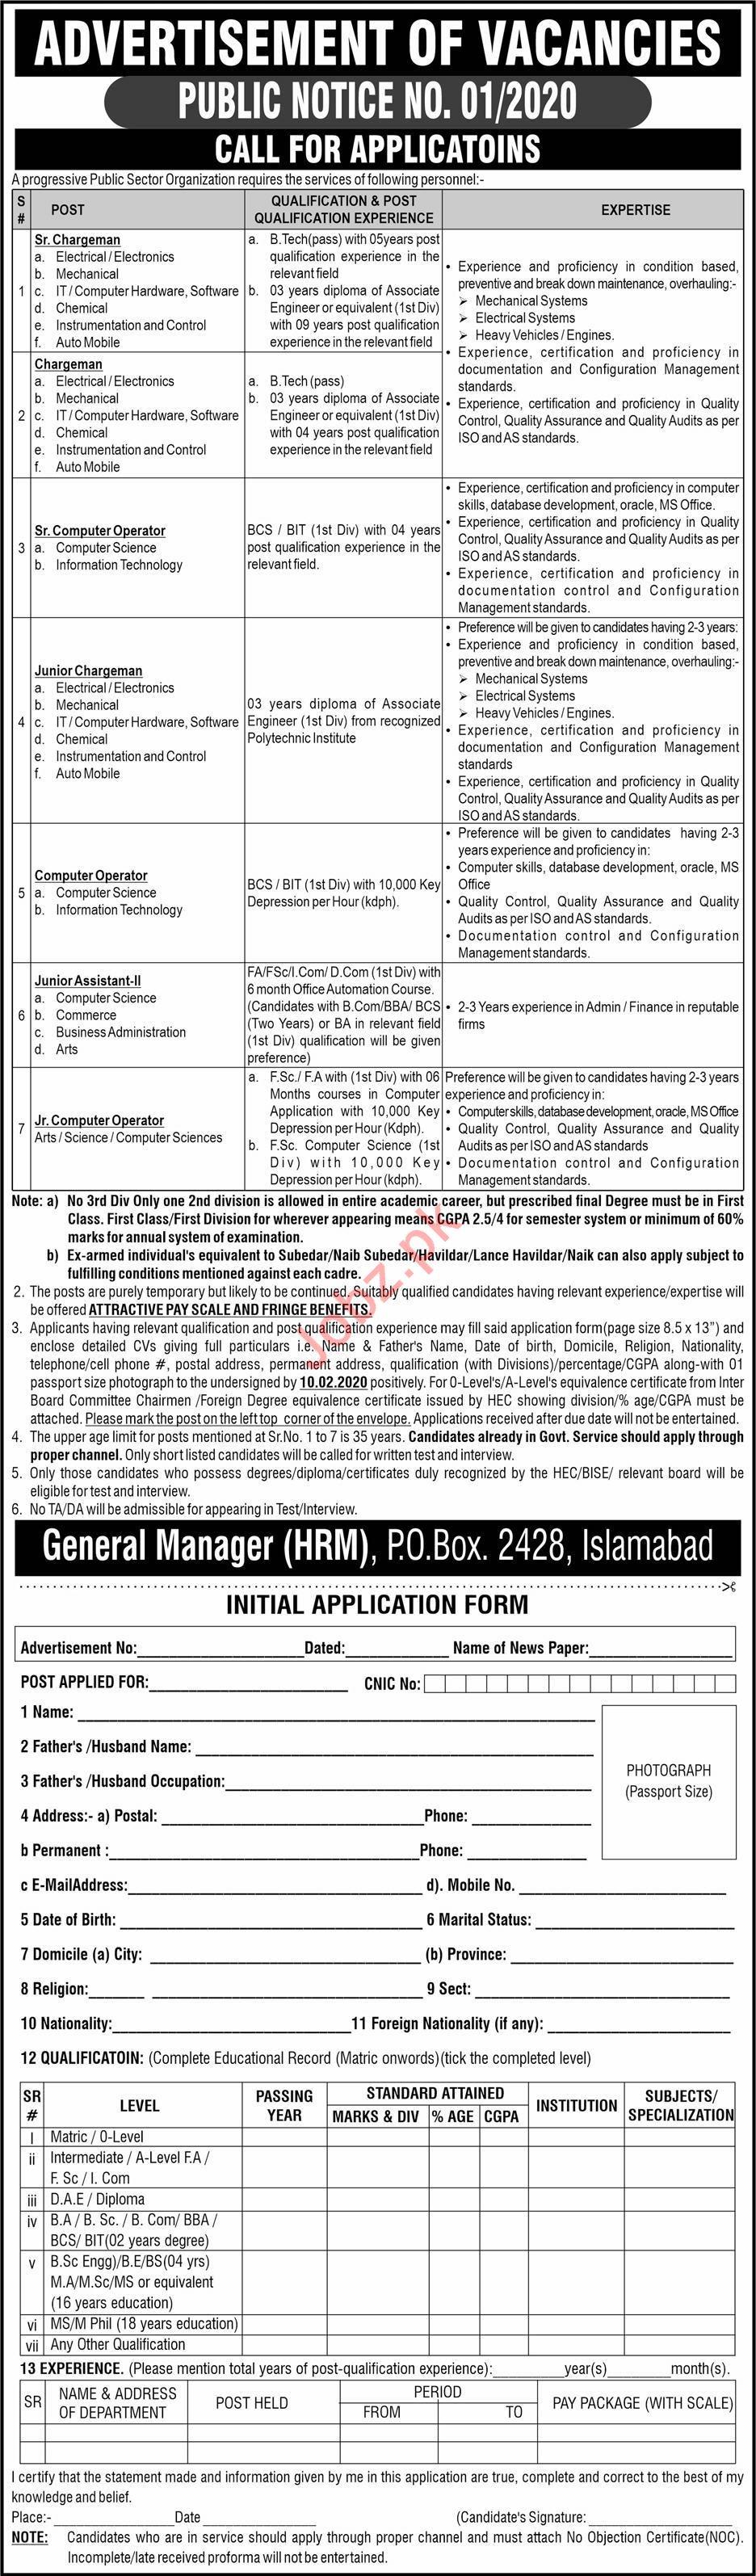 Public Sector Organization Jobs 2020 For Islamabad